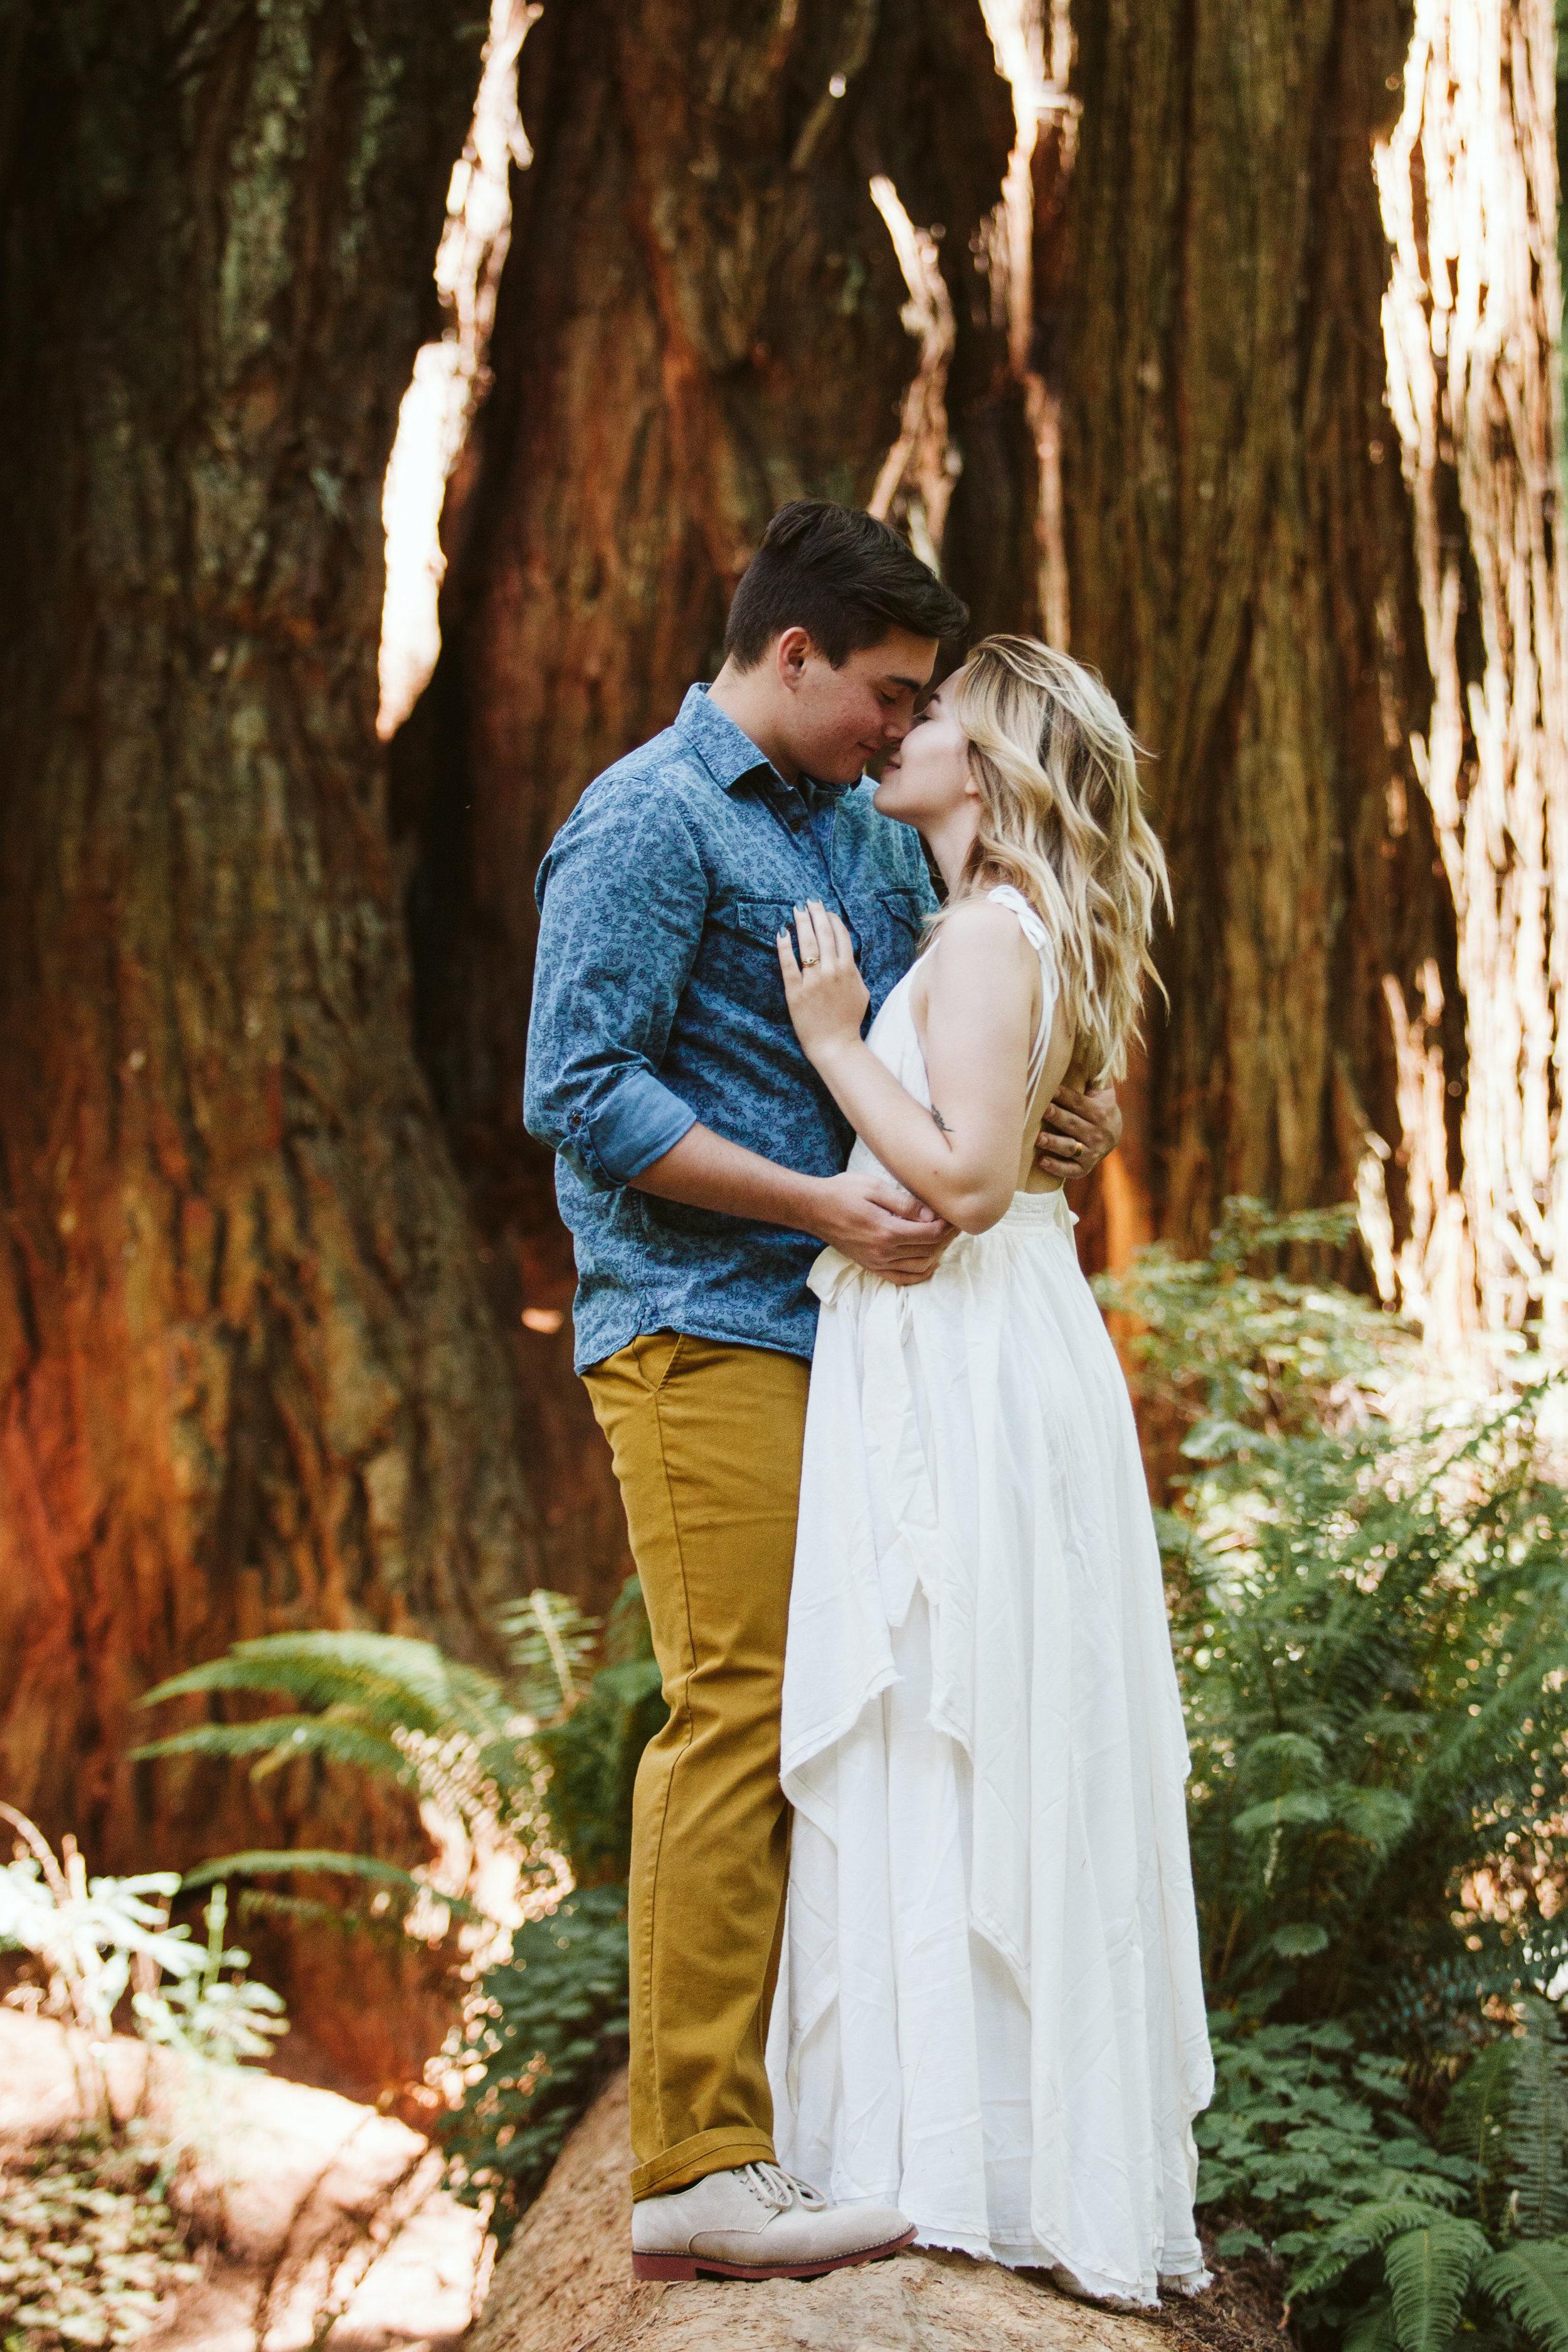 Hannah&Ben_Redwoods_Elopement_Engagement_PNW_SouthernOregon_NorthernCalifornia_ (10 of 23).jpg